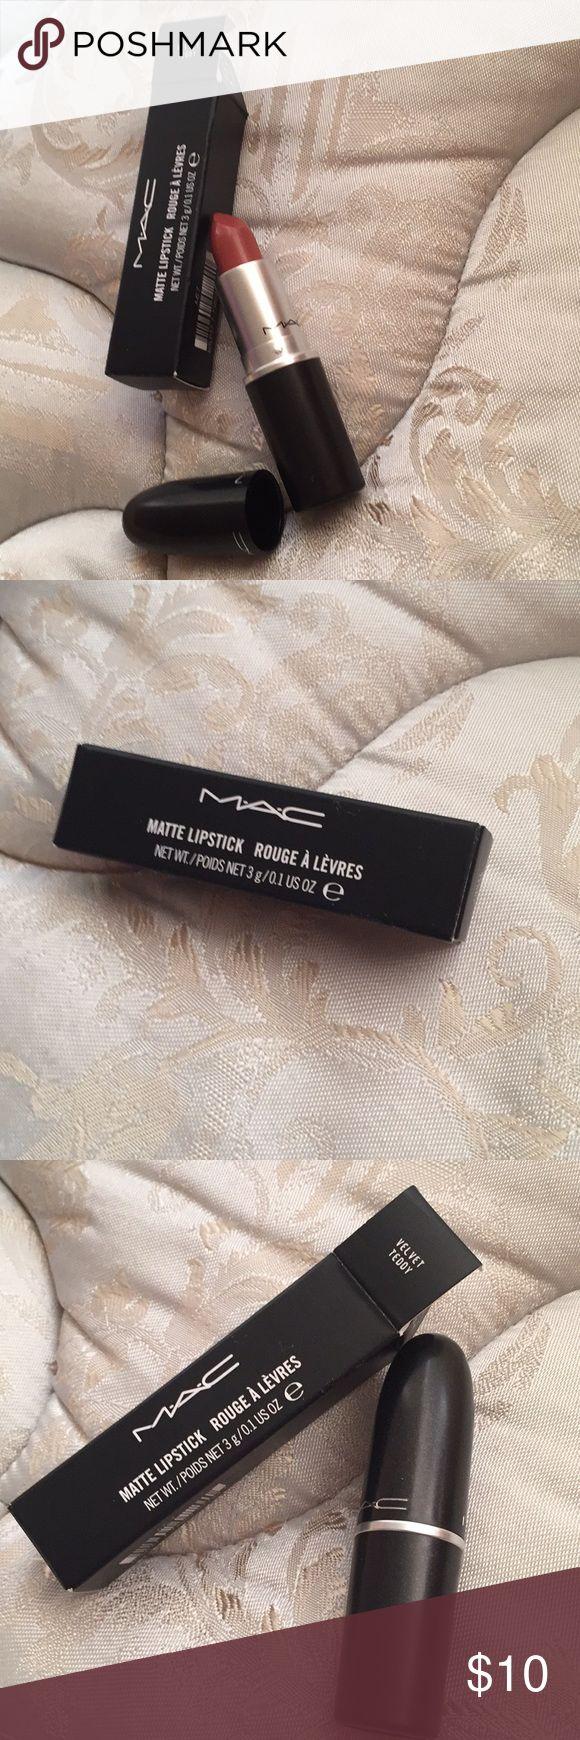 MAC Velvet Teddy Matte Lipstick Brand new Mac Matte Lipstick in Velvet Teddy MAC Cosmetics Makeup Lipstick